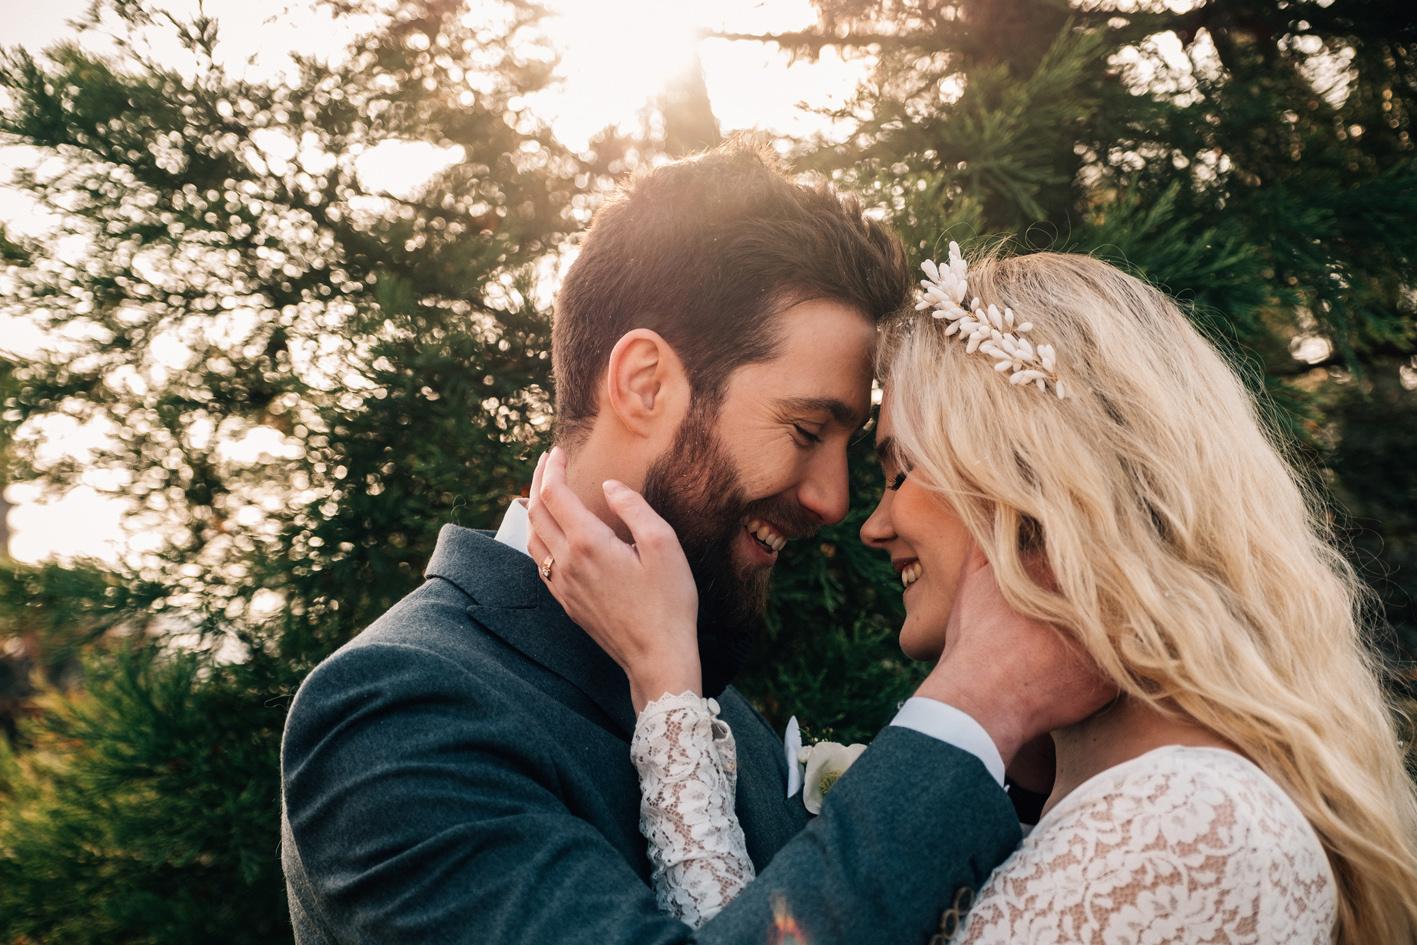 Pierre atelier / photographer wedding Paris / Photographe mariage/ elopement elopinparis weddingplanner